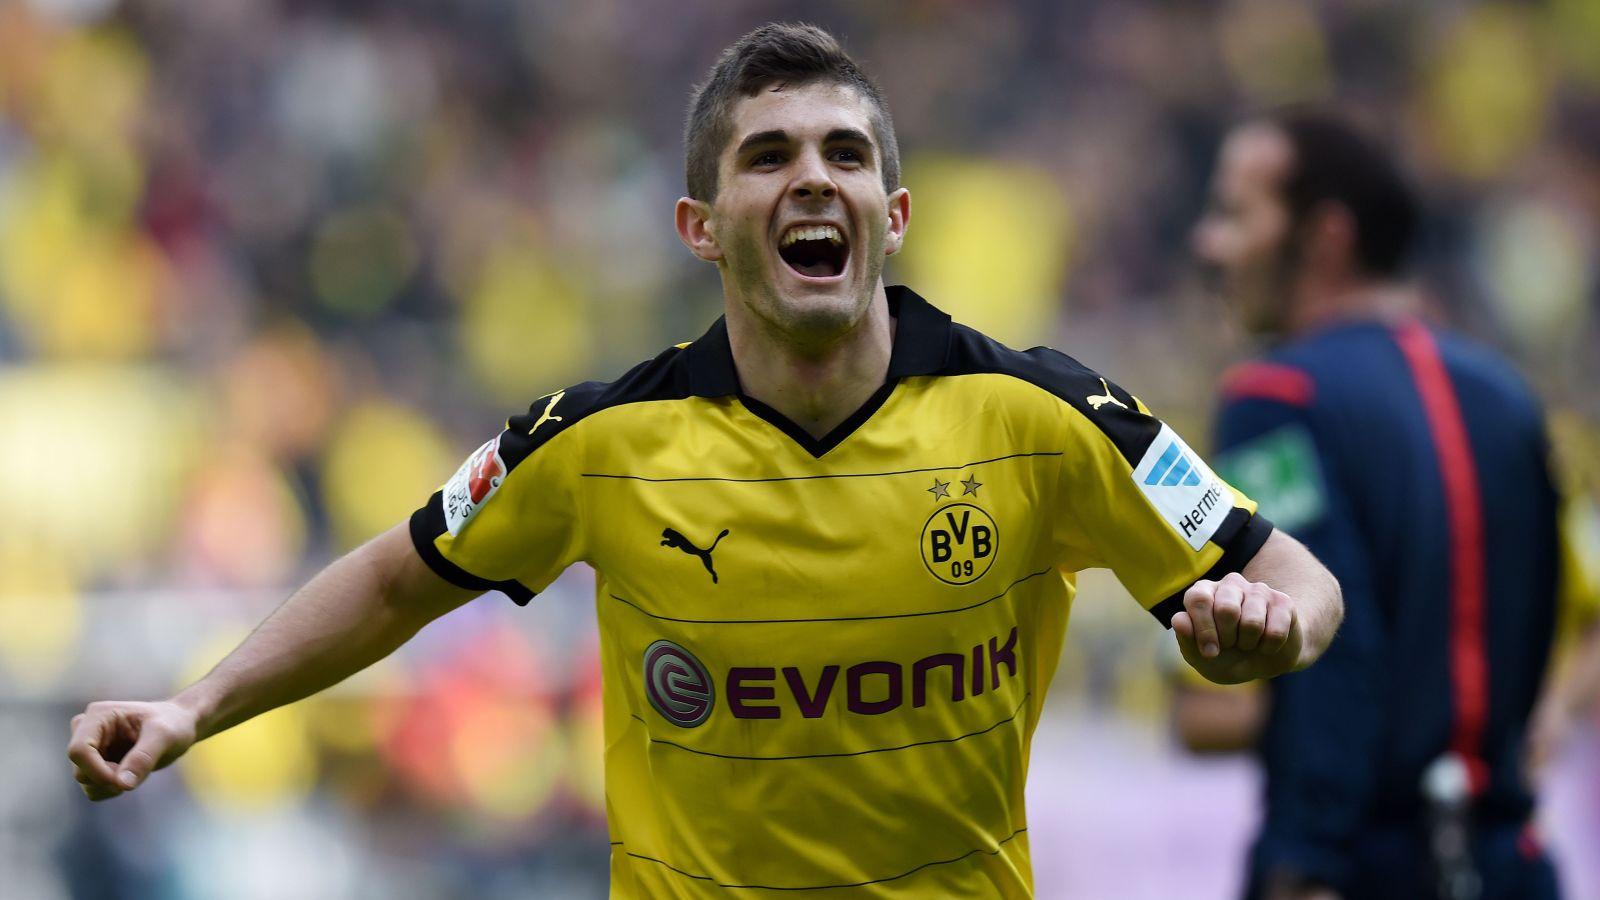 Christian Pulisic scores his first Bundesliga goal for Borussia Dortmund